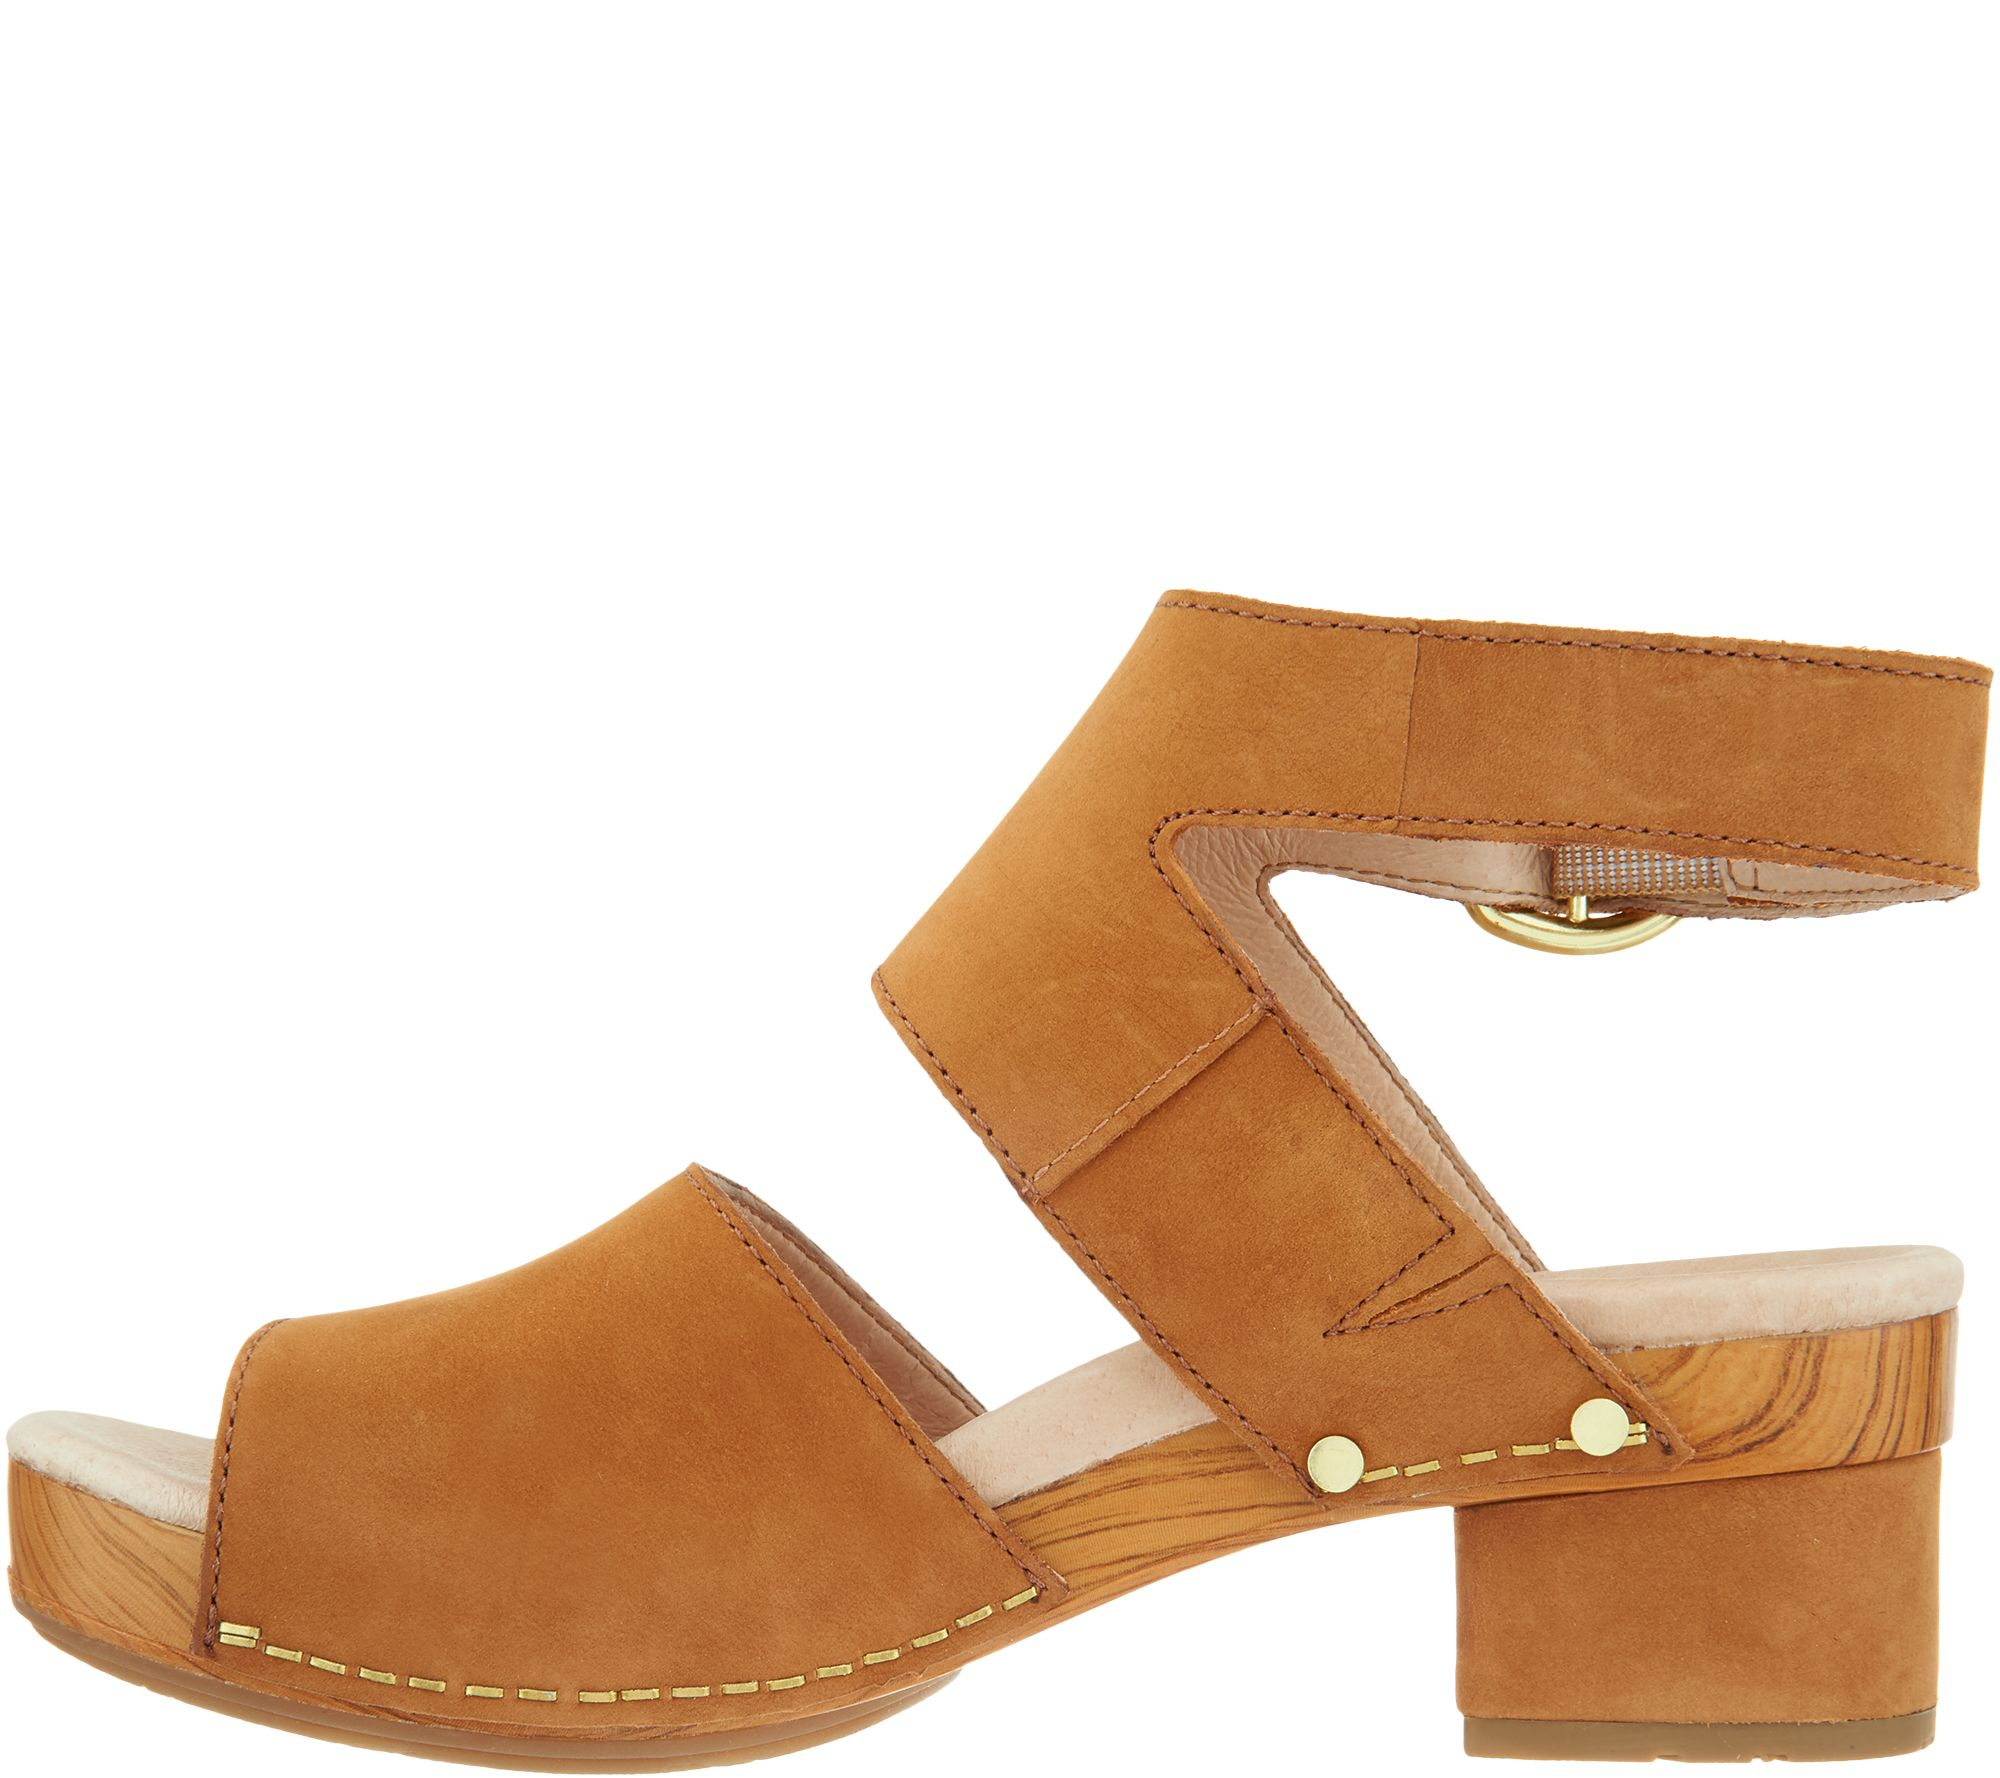 6e70d260b38 Dansko Leather Heeled Sandals - Minka - Page 1 — QVC.com